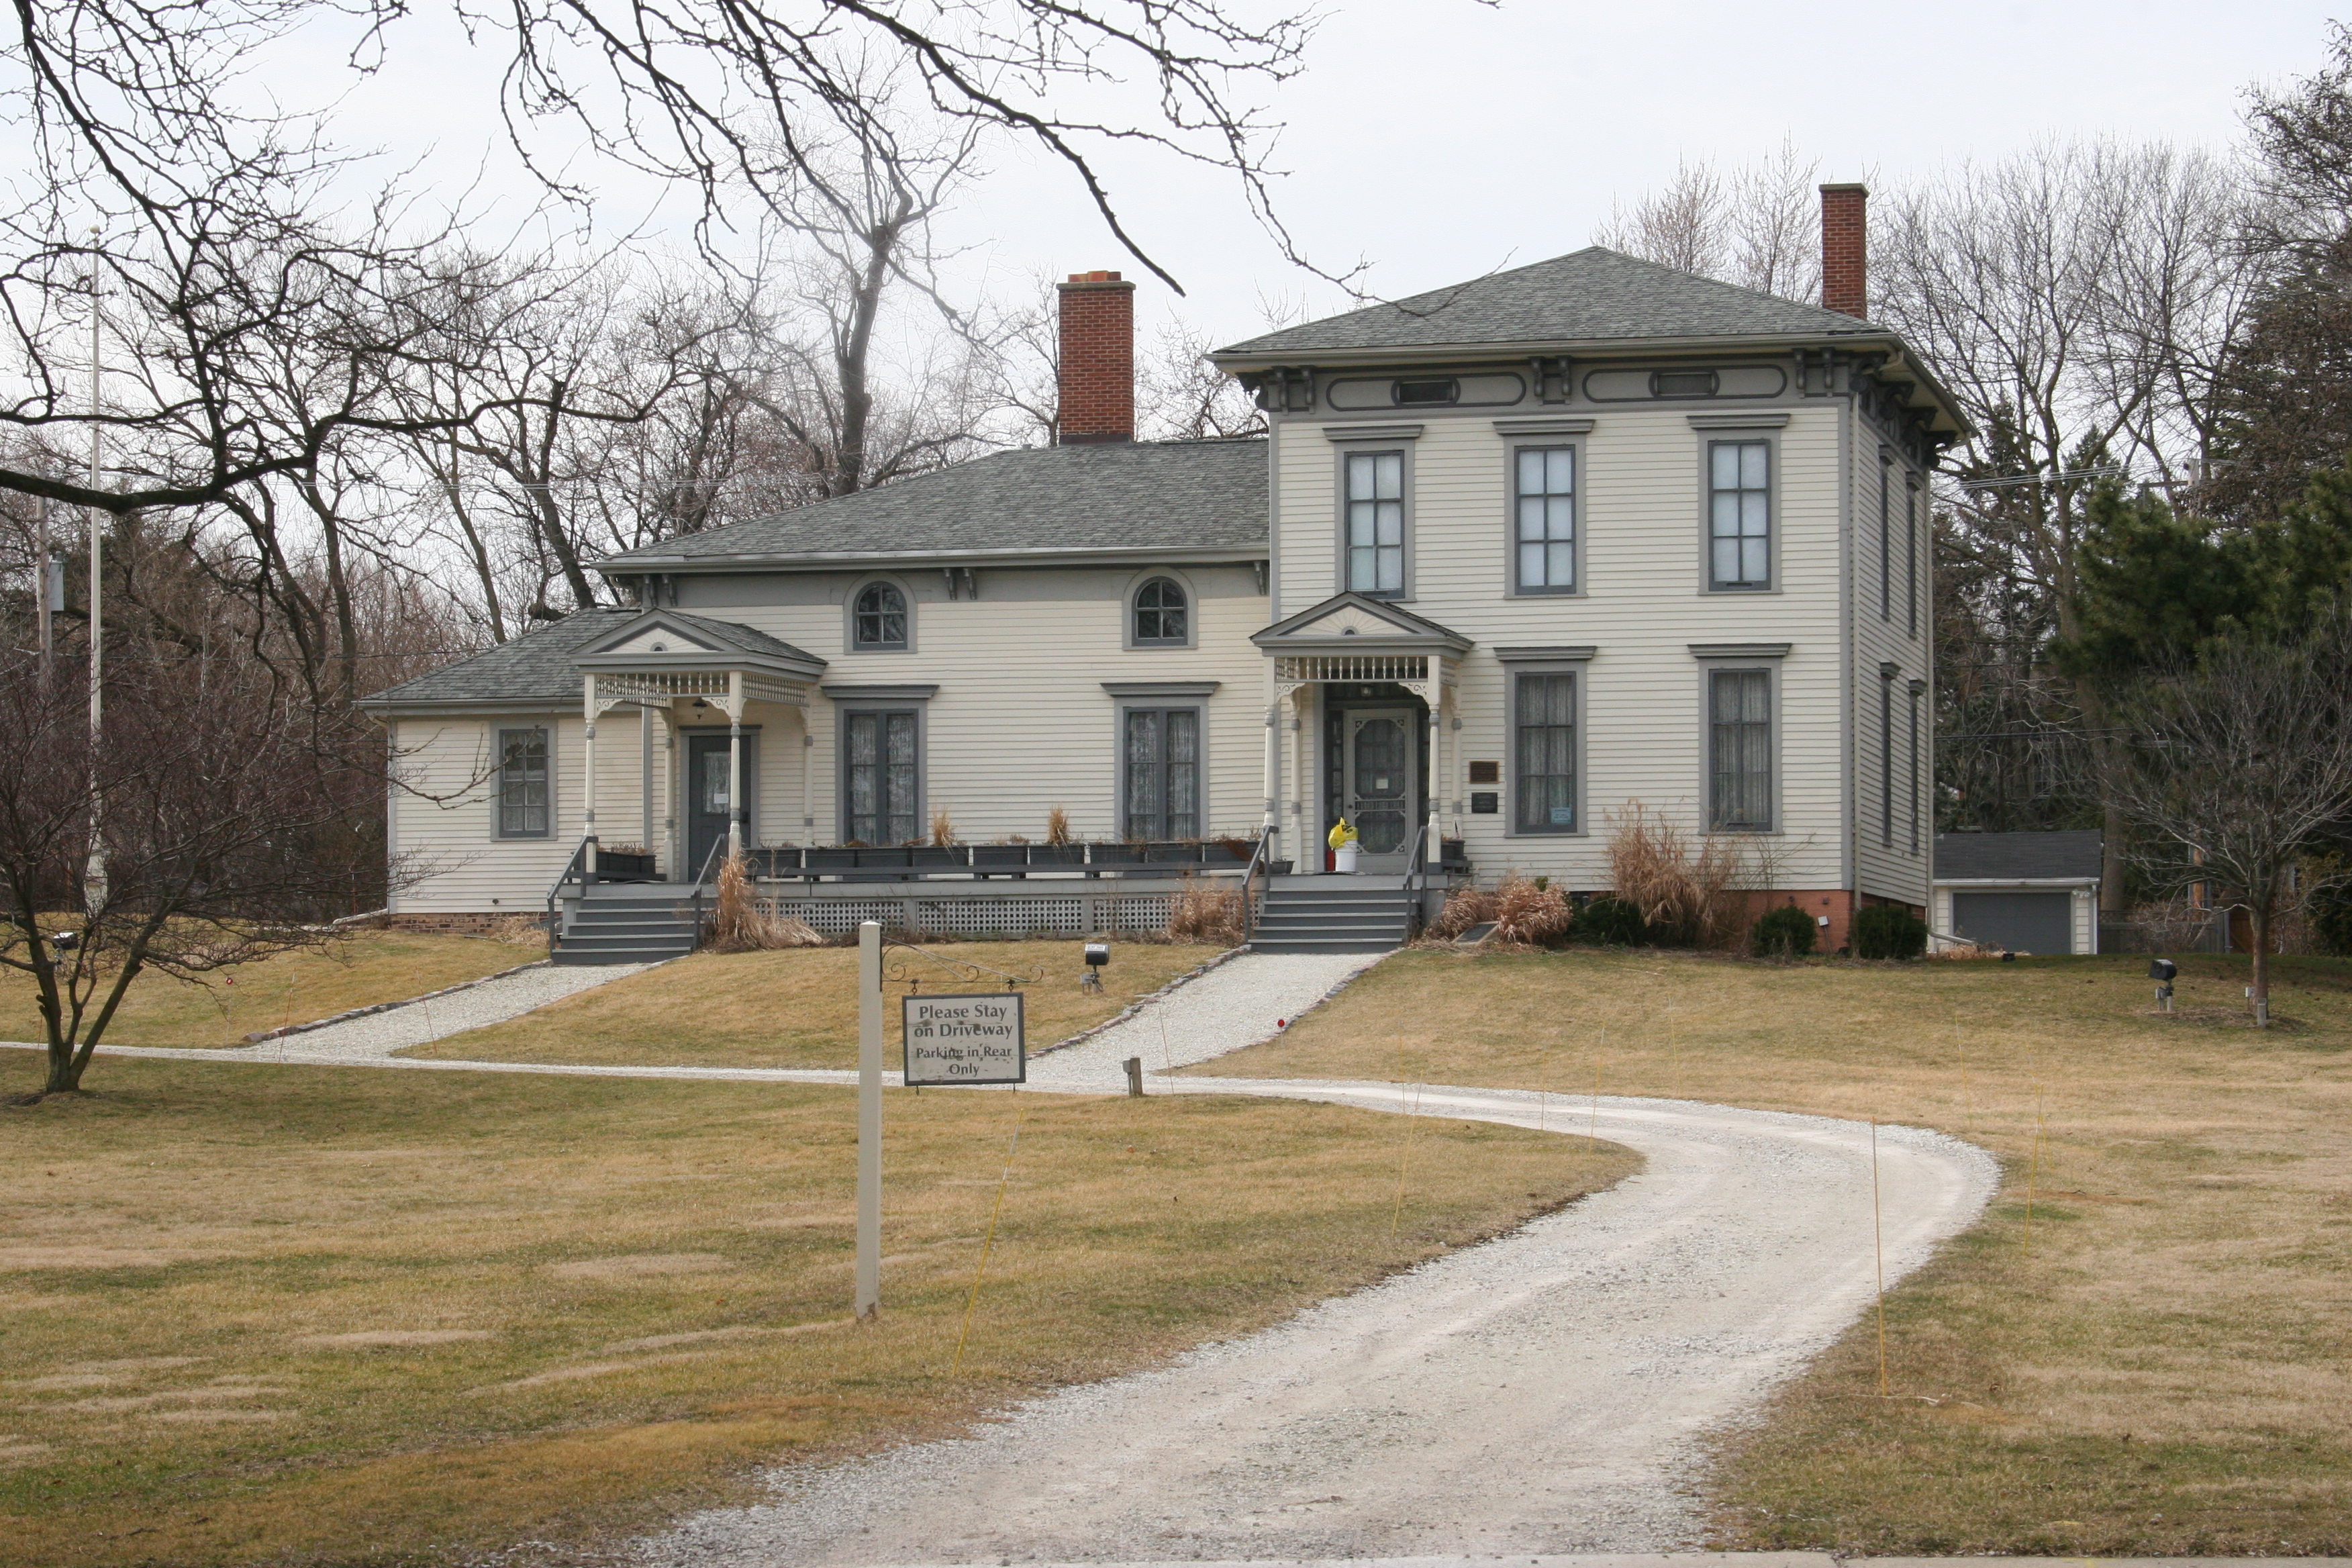 The Noble–Seymour–Crippen House,a Chicago Landmark, at 5624 N Newark Ave.